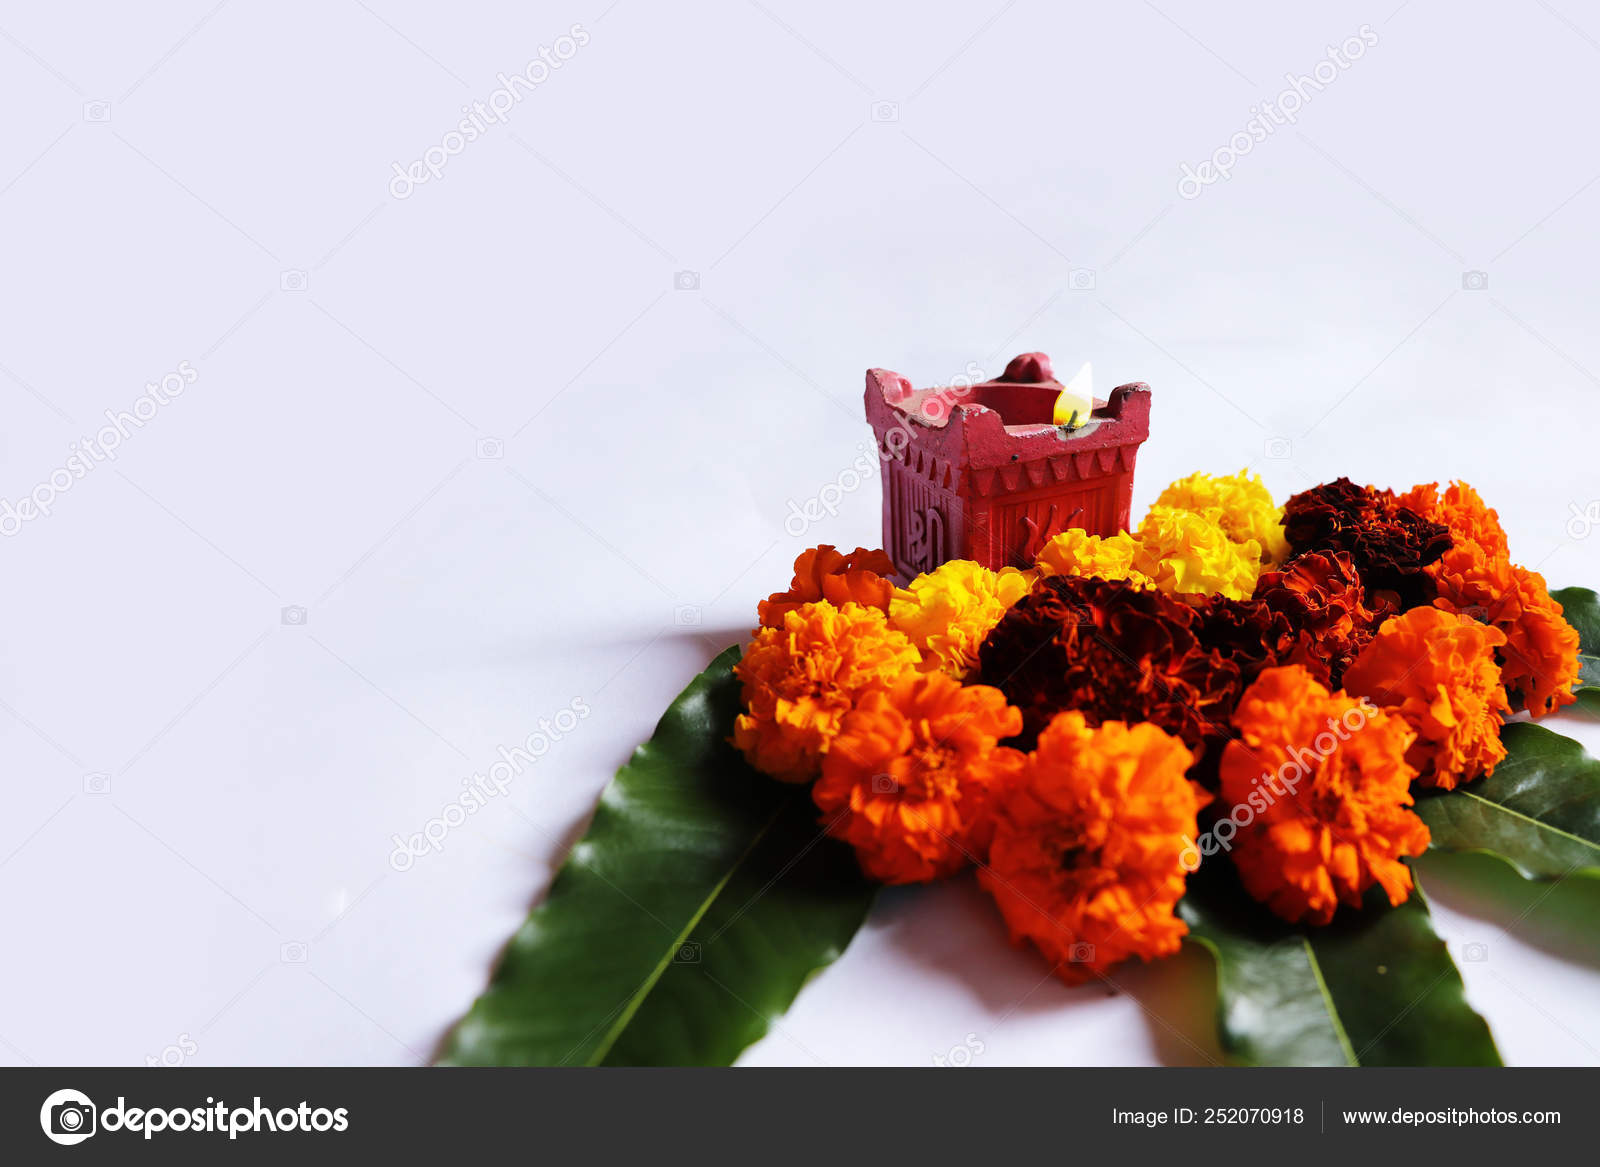 Flower Rangoli Diwali Pongal Festival Made Using Marigold Zendu Flowers Stock Photo C Abhi R P 252070918